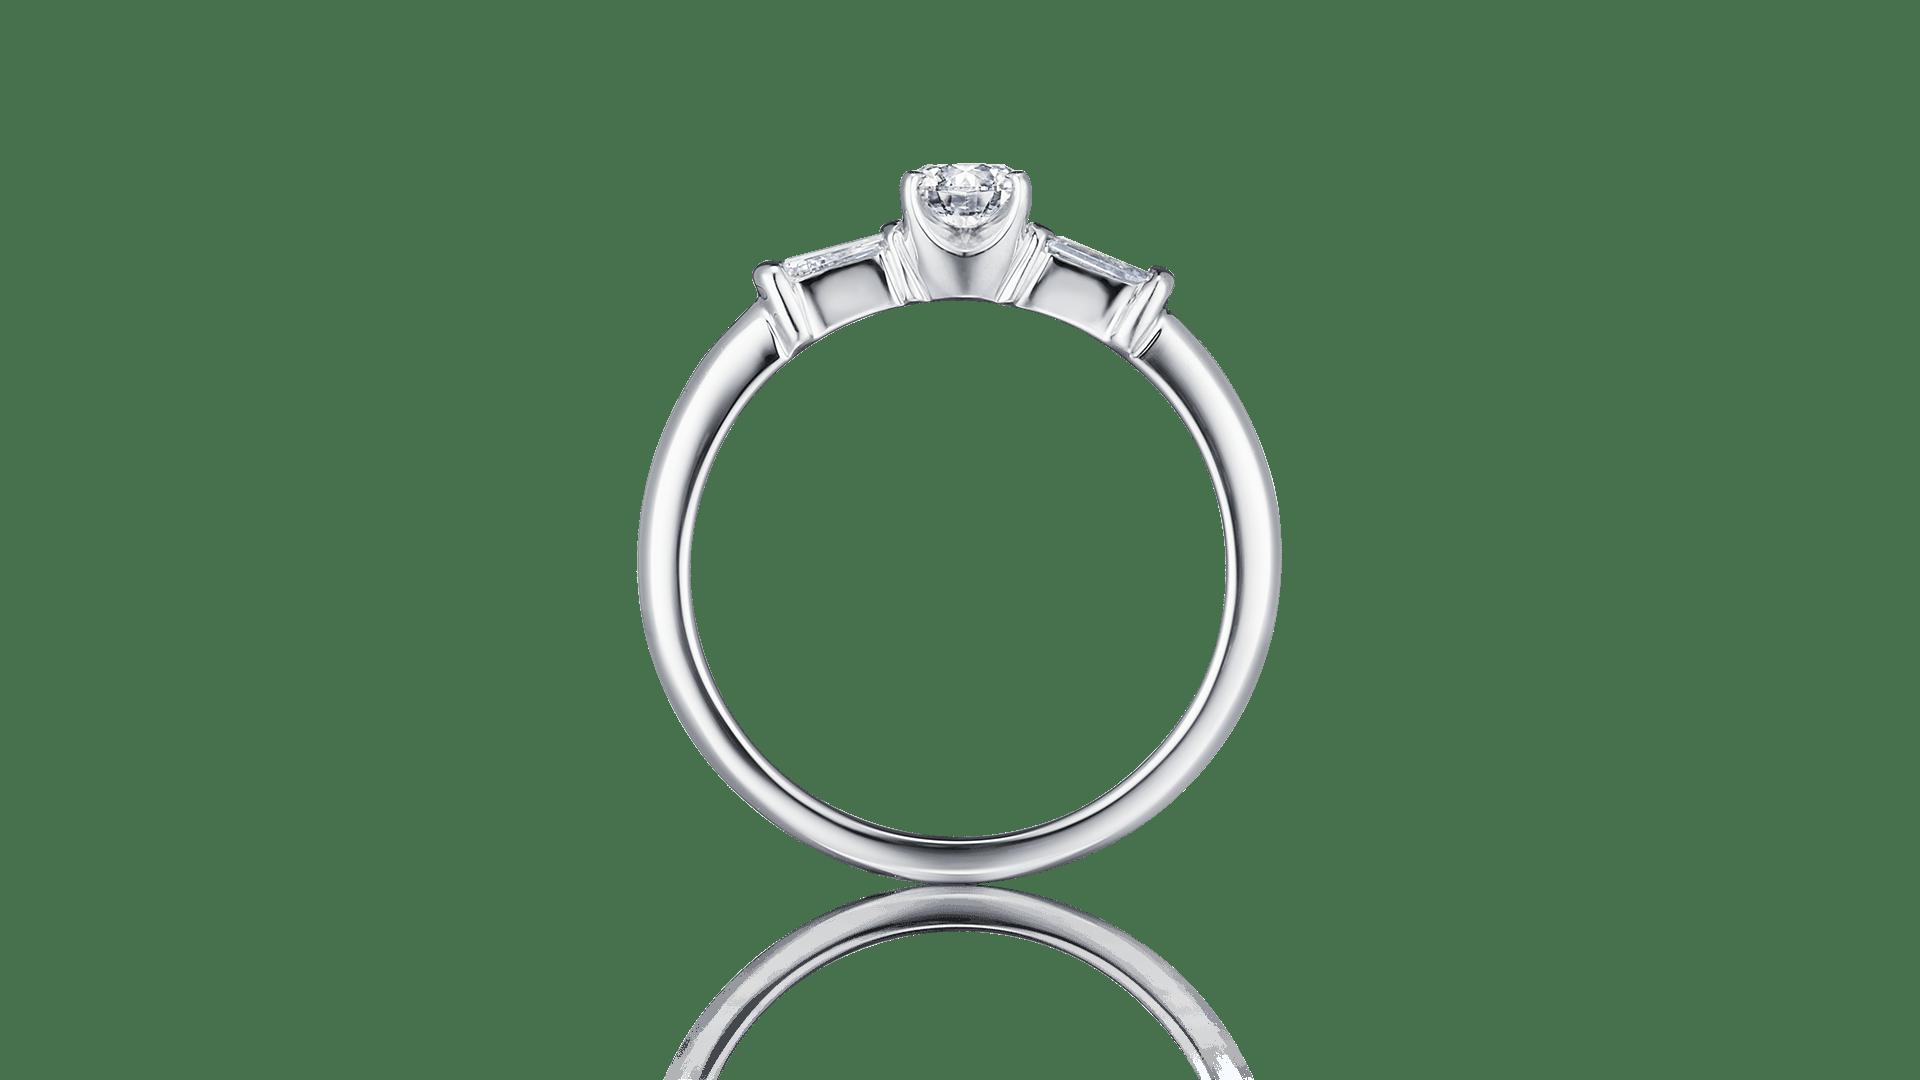 shaula シャウラ | 婚約指輪サムネイル 2